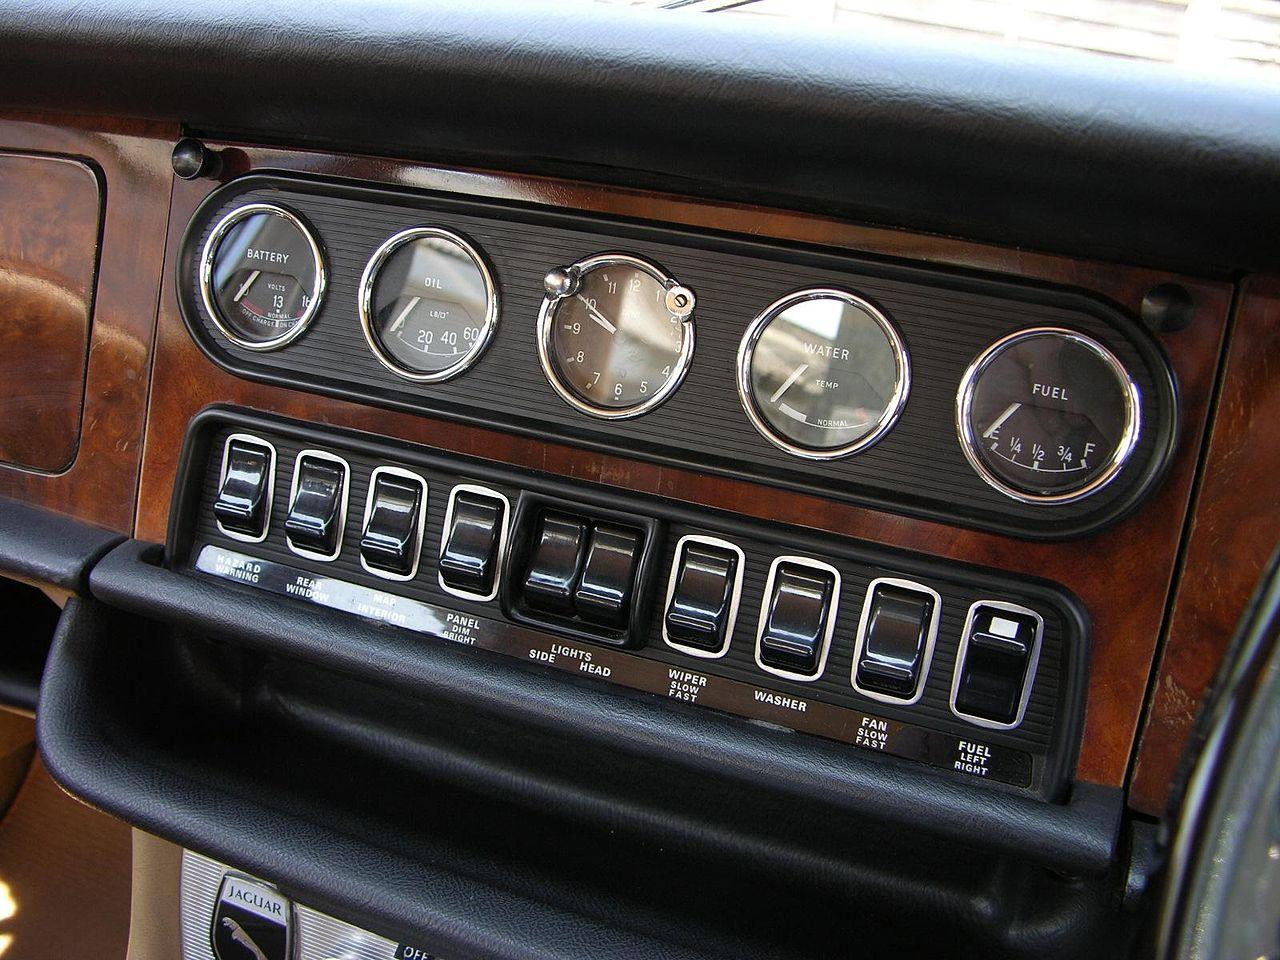 file 1970 jaguar xj6 4 2 series 1 flickr the car spy 16 jpg wikimedia commons. Black Bedroom Furniture Sets. Home Design Ideas